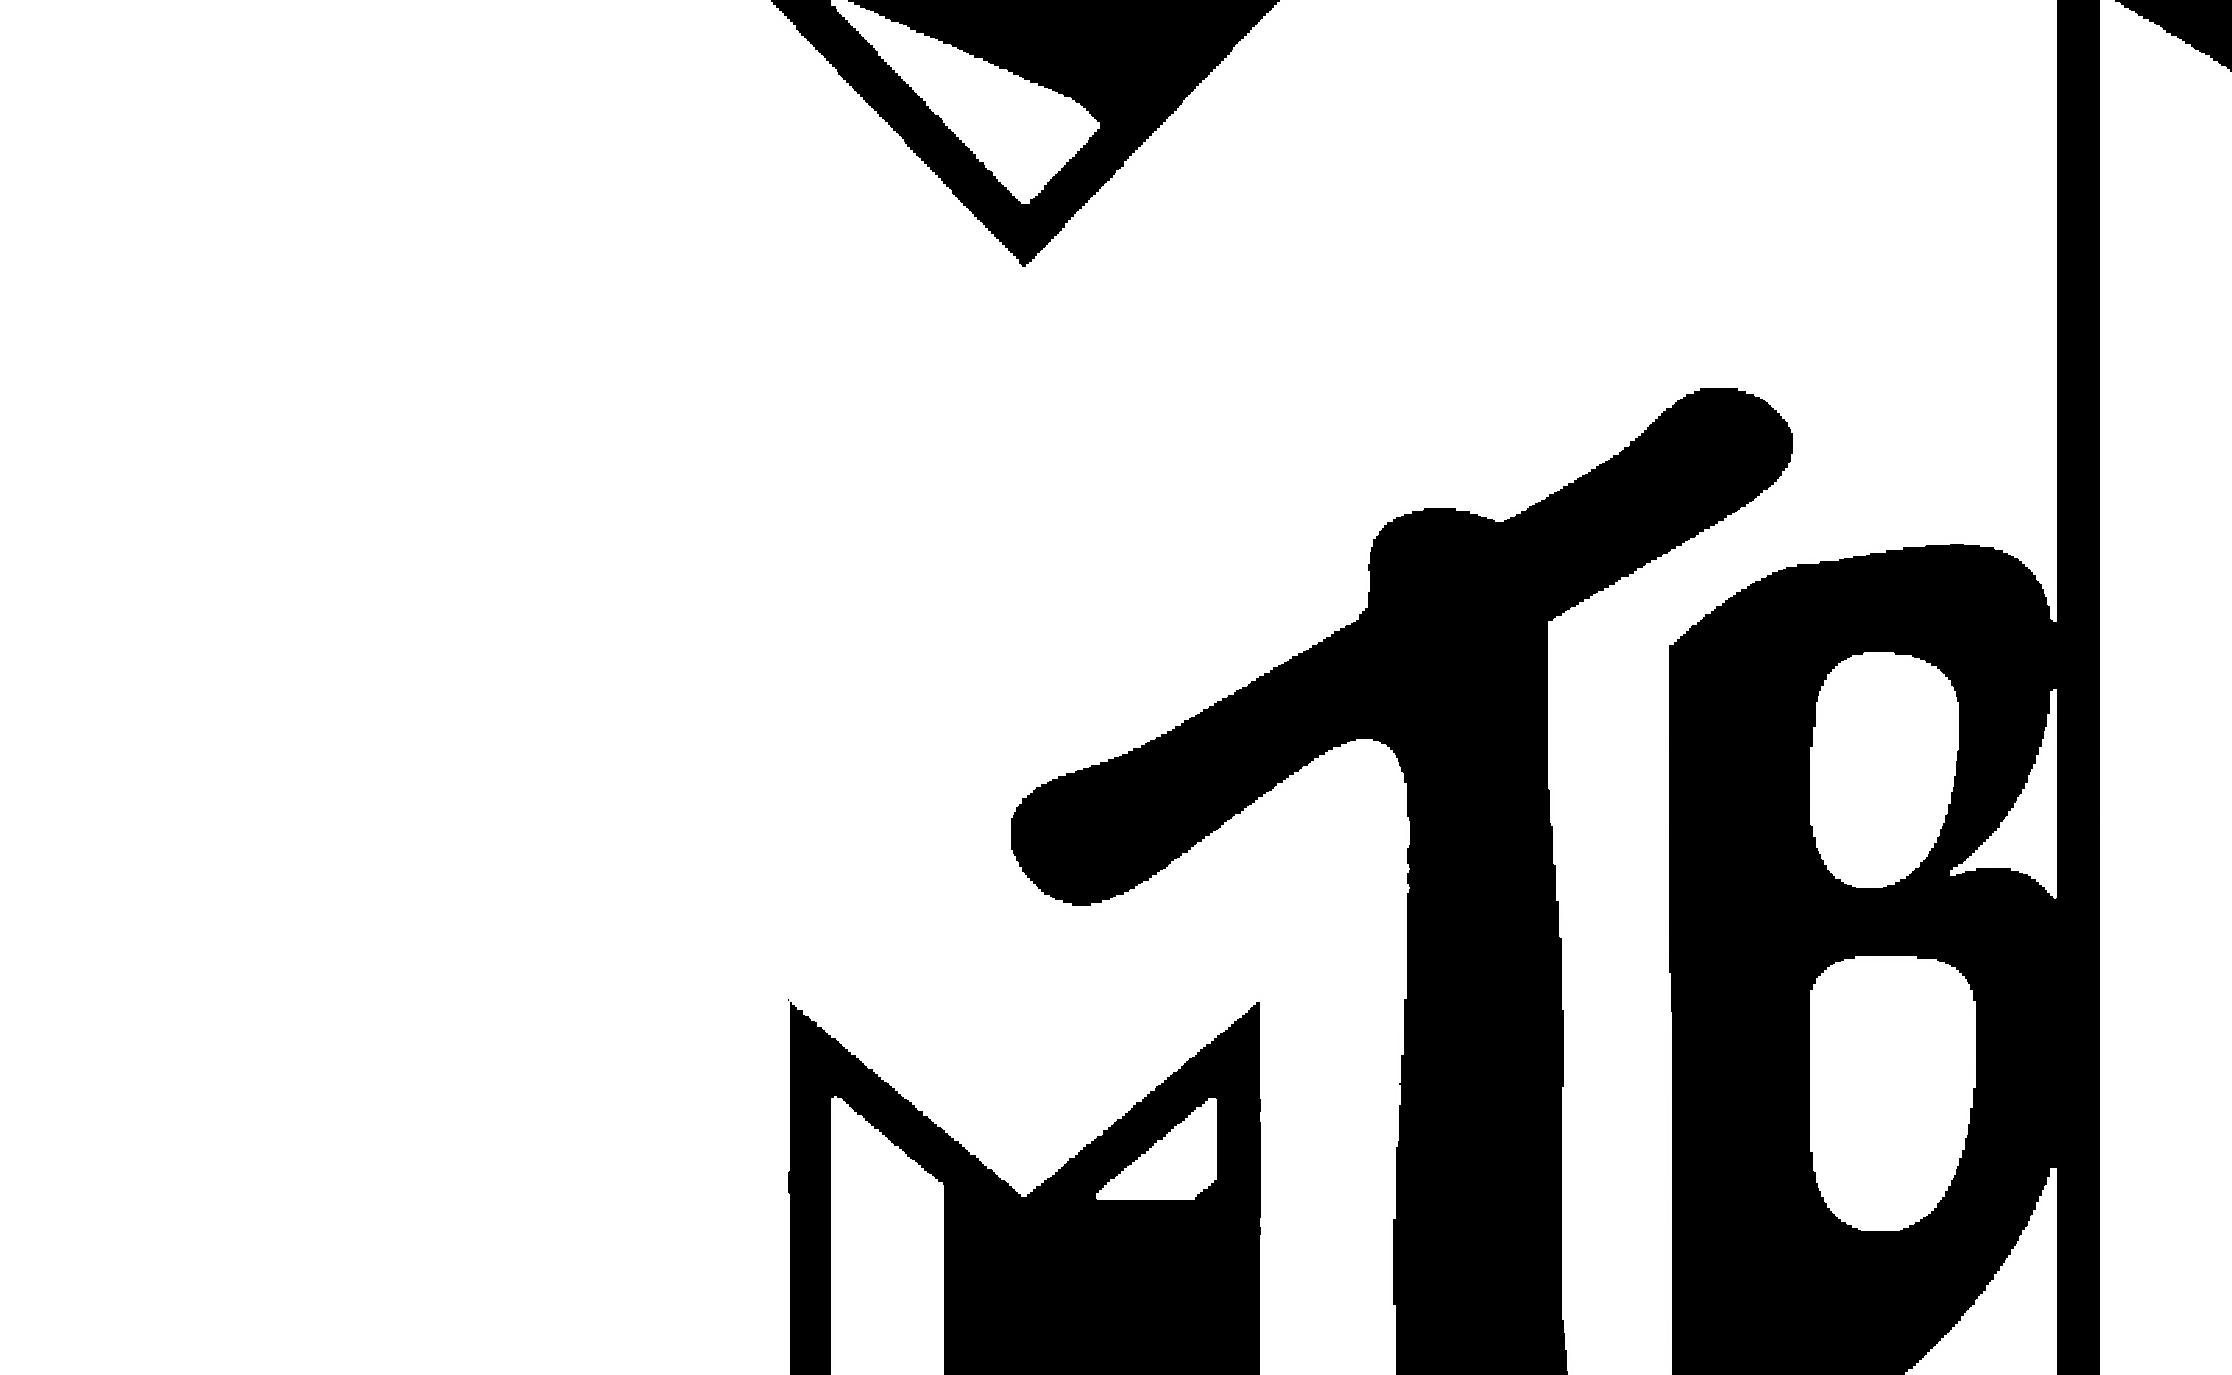 МТВ (Белый)